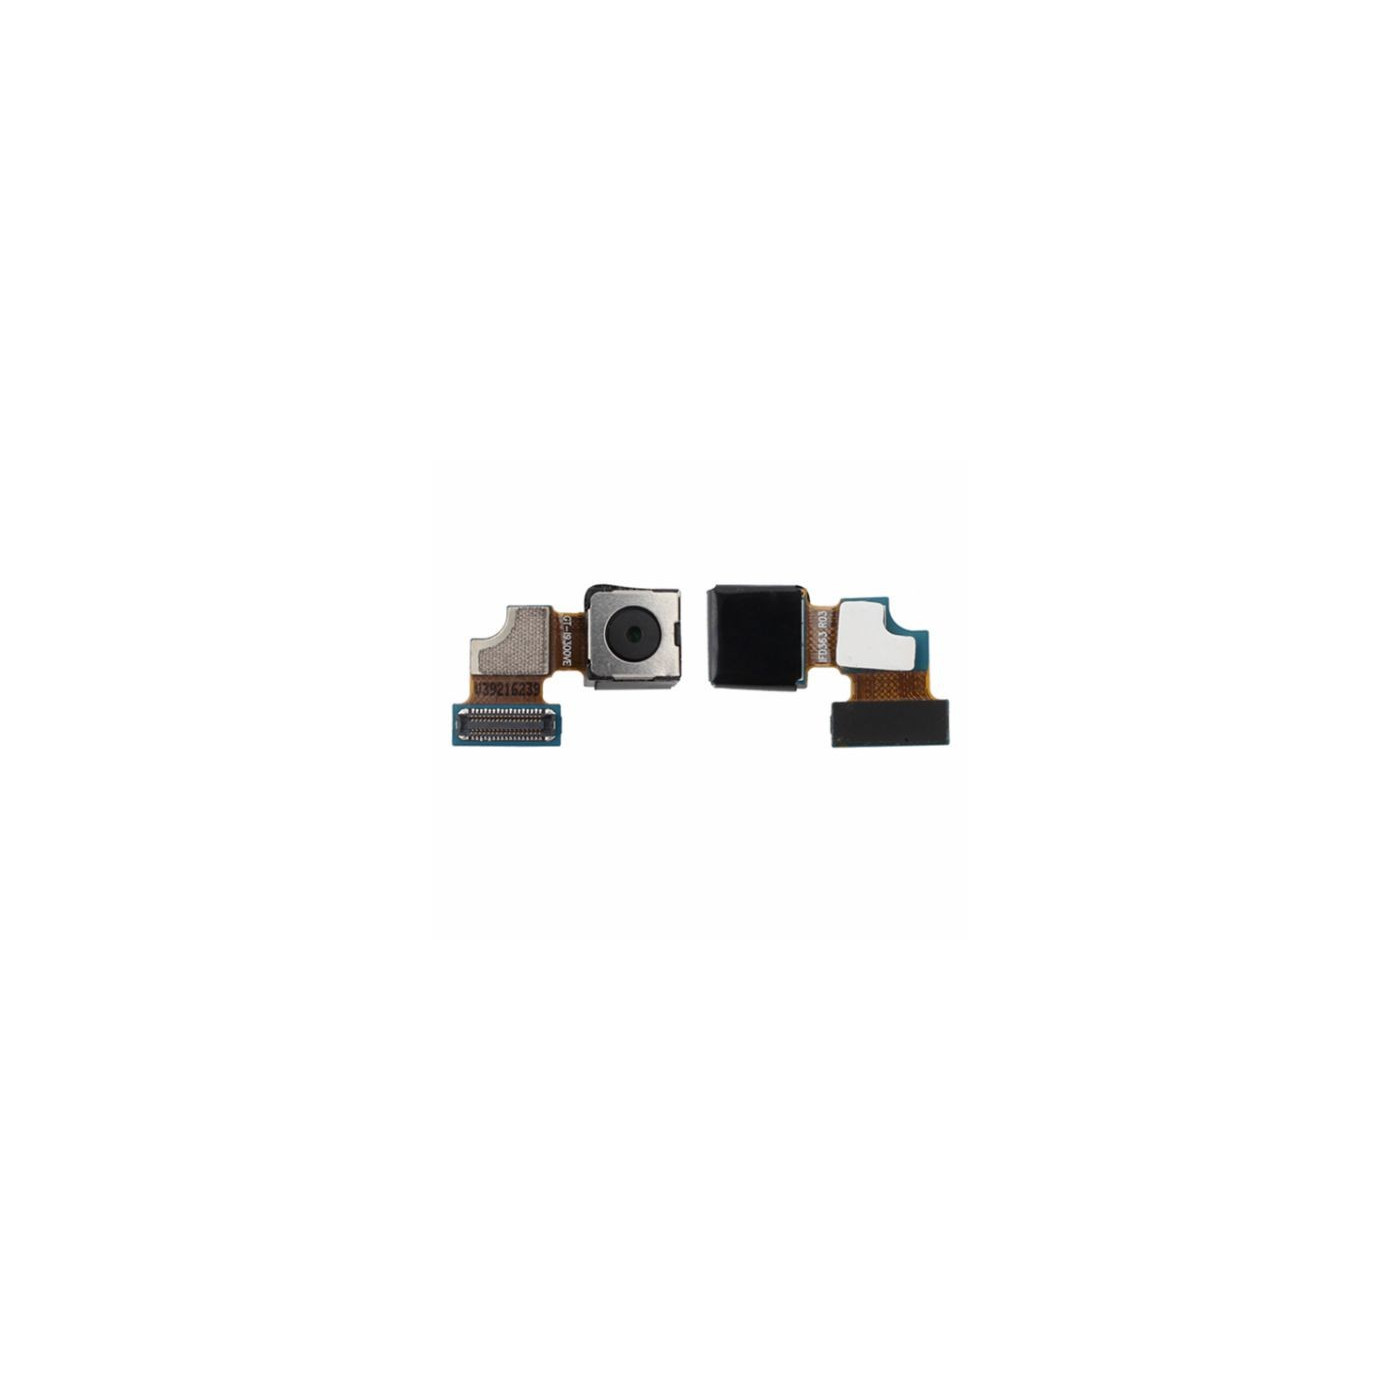 Cámara trasera Samsung S3 I9300 Galaxy Camera Flat Flex Replacement